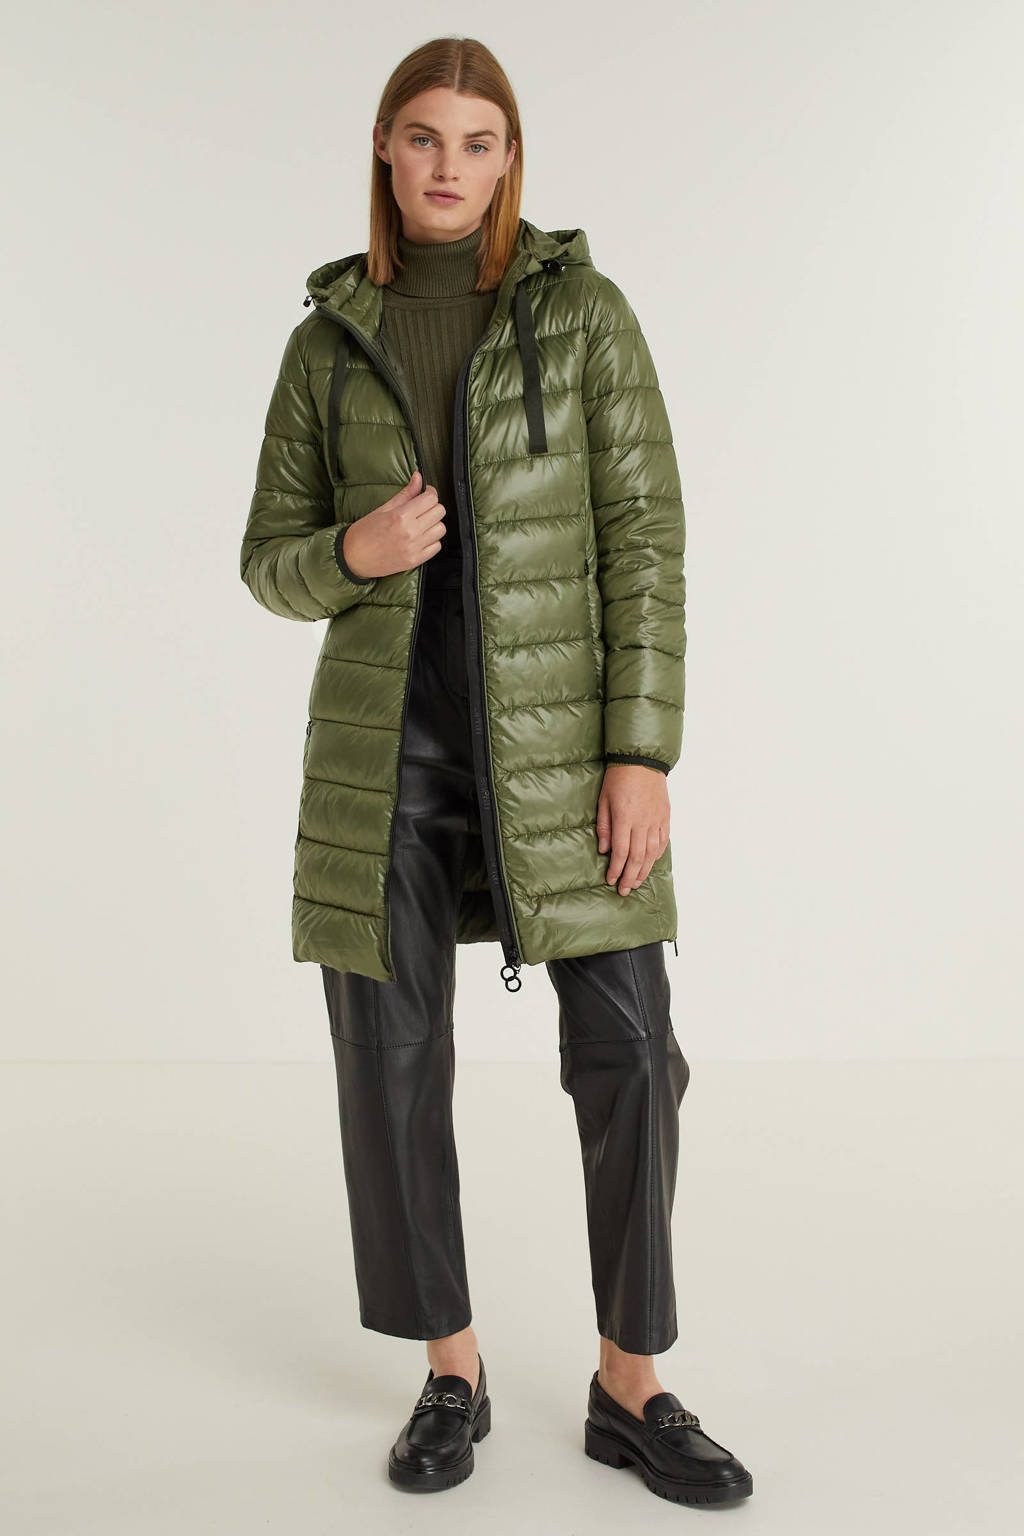 ESPRIT Women Casual gewatteerde jas van gerecycled polyester groen, Groen